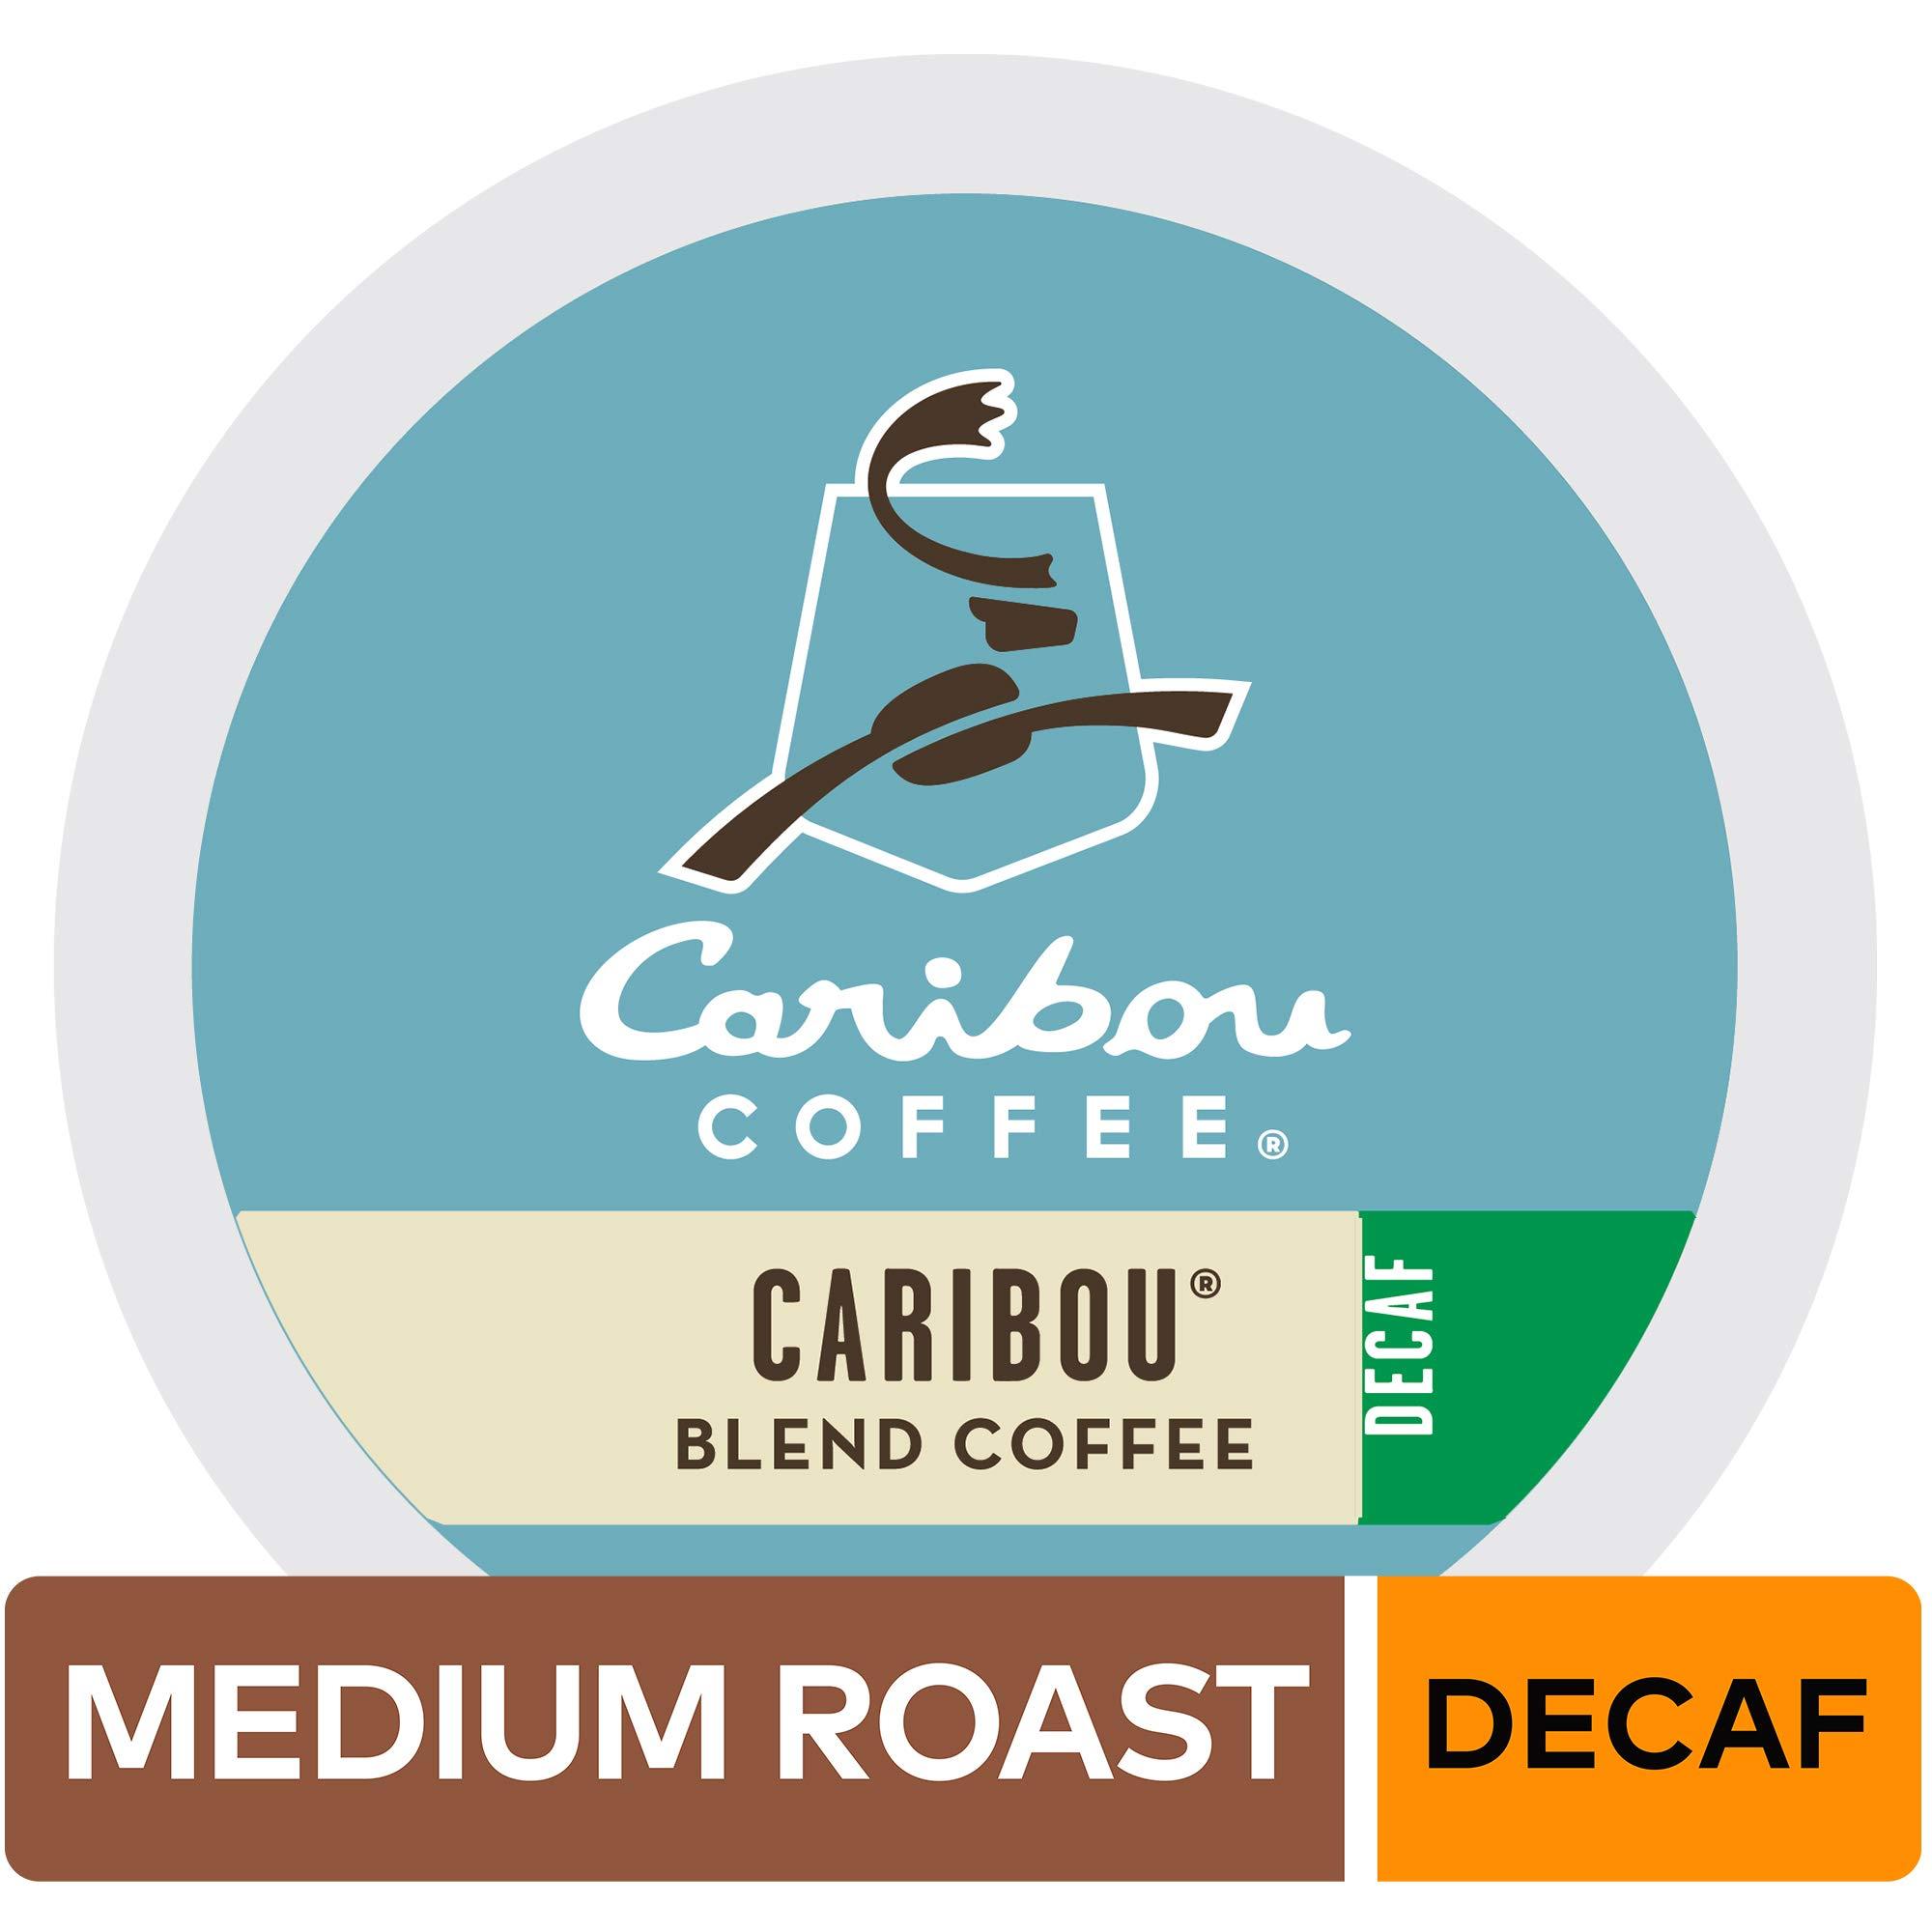 Caribou Coffee Caribou Blend, Single Serve Coffee K-Cup Pod, Decaf, 96